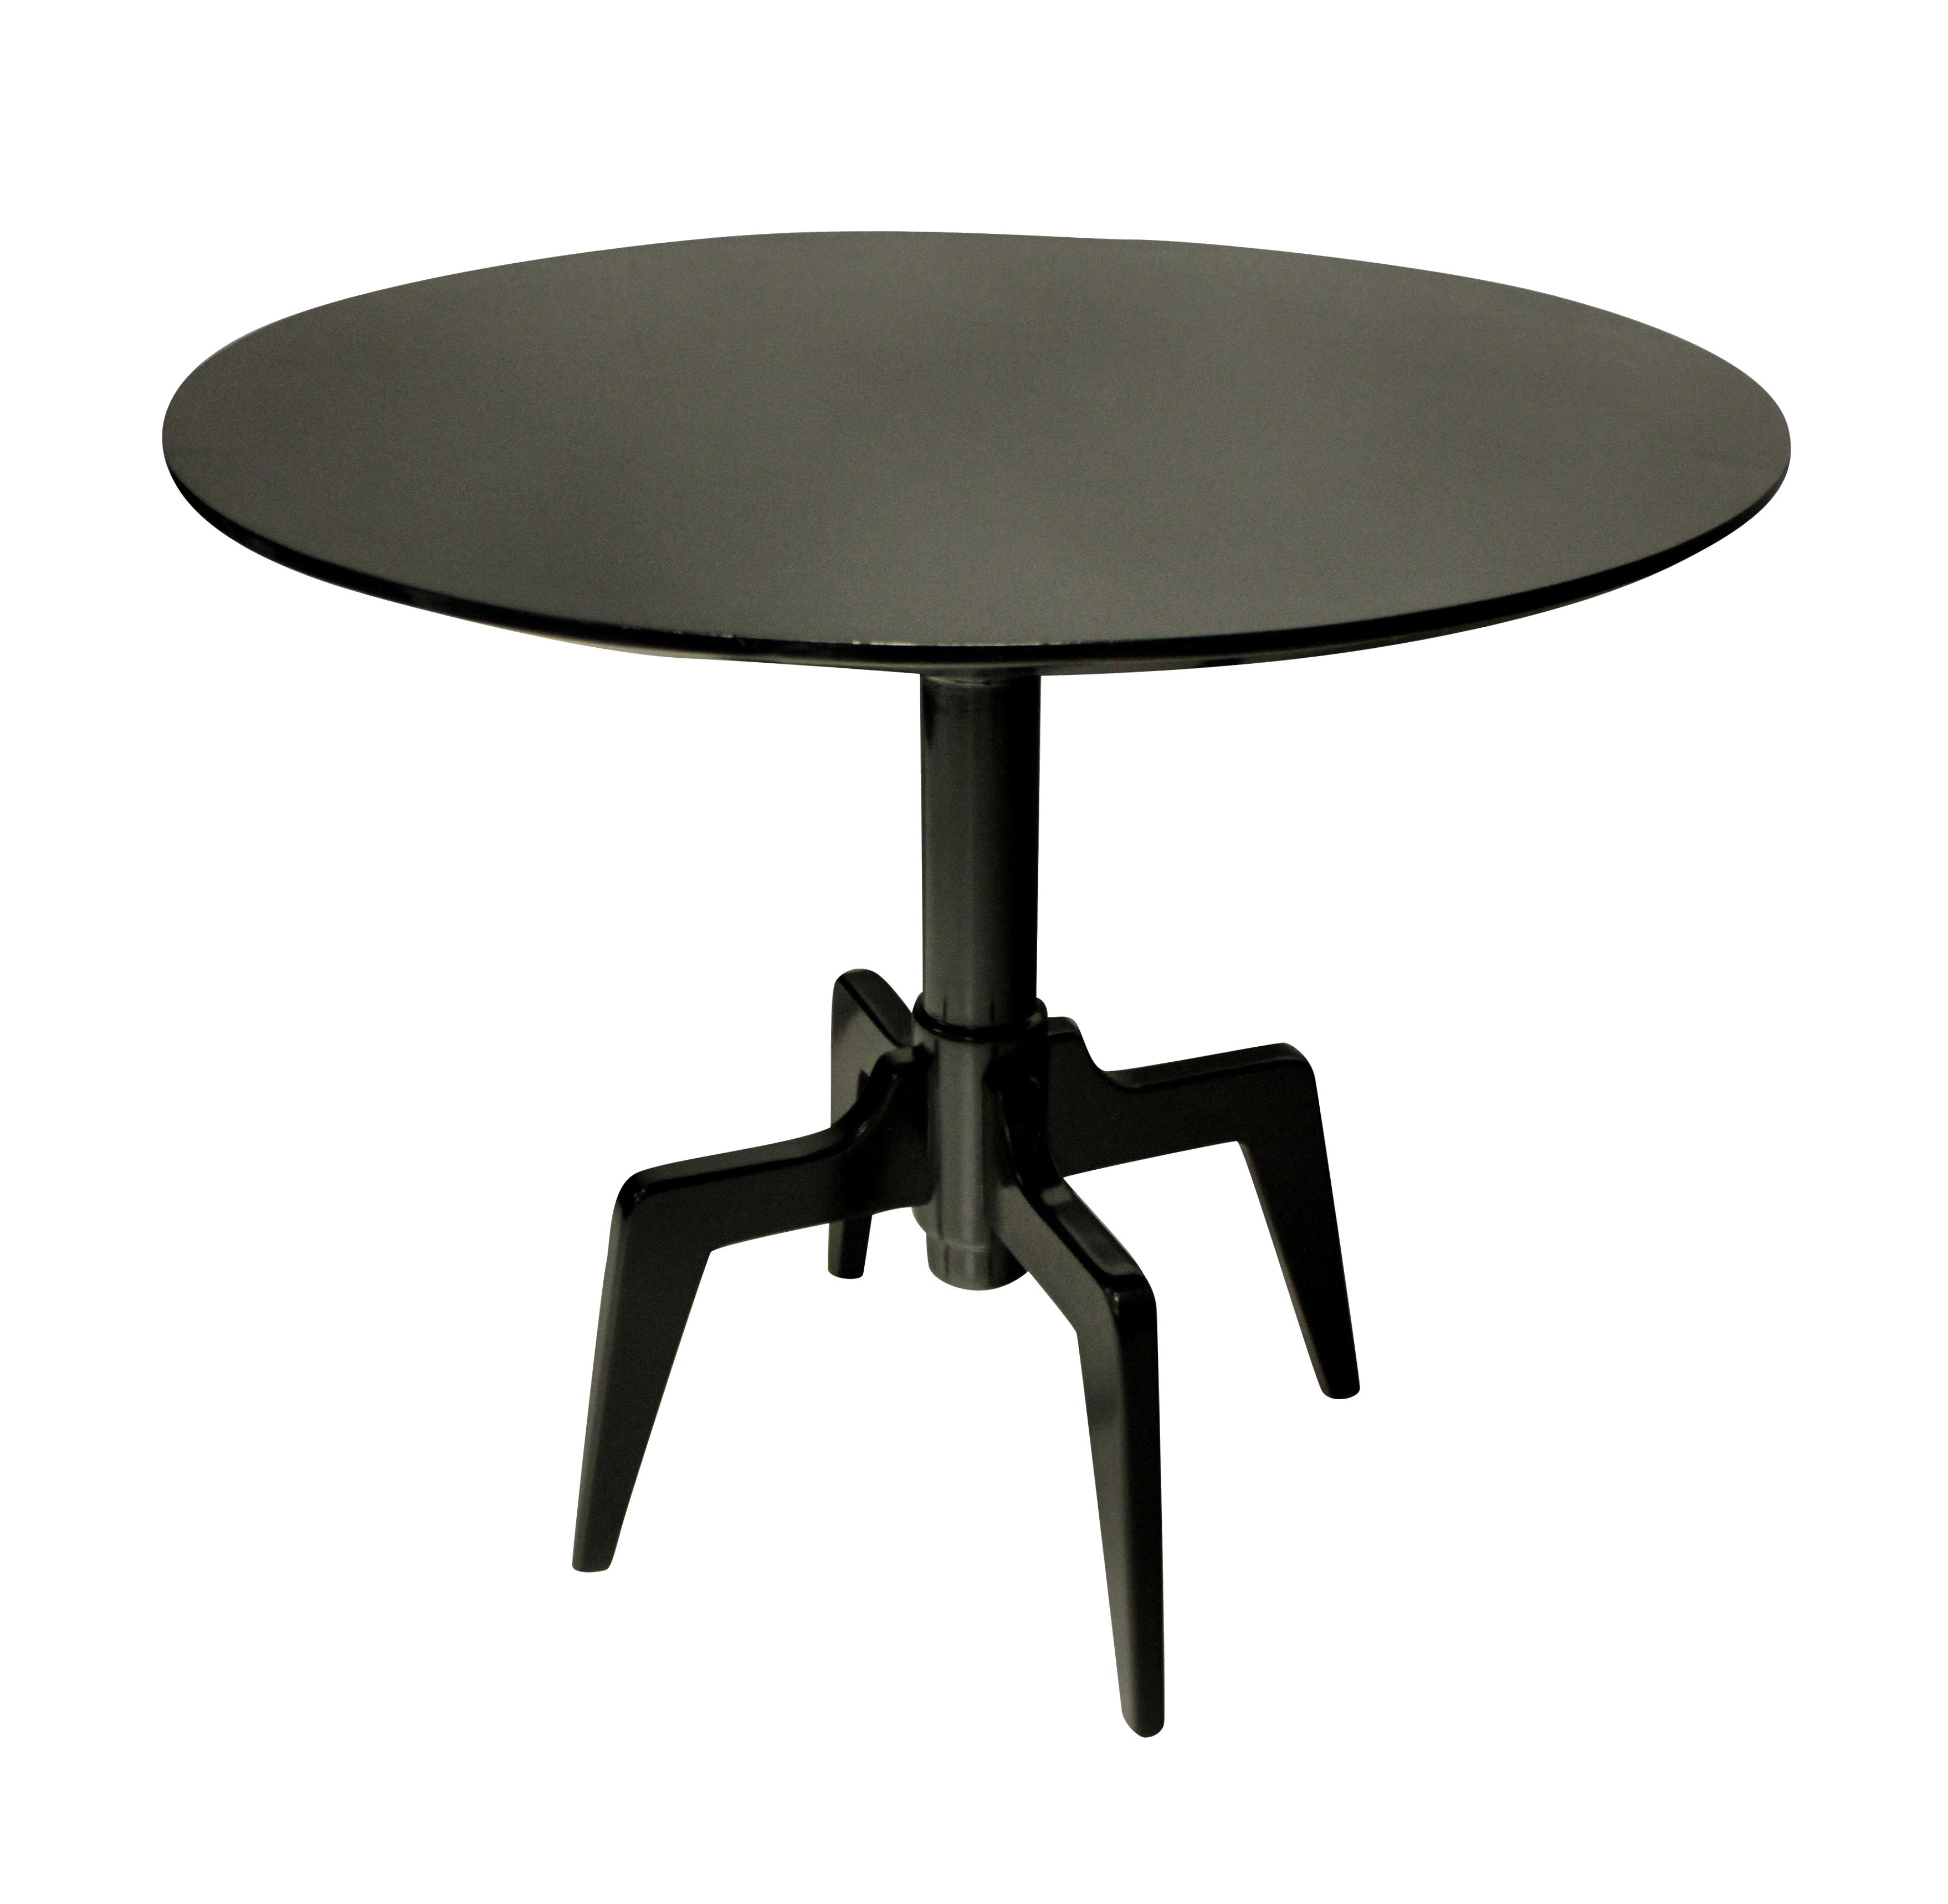 AN UNUSUAL ITALIAN MID-CENTURY SIDE TABLE